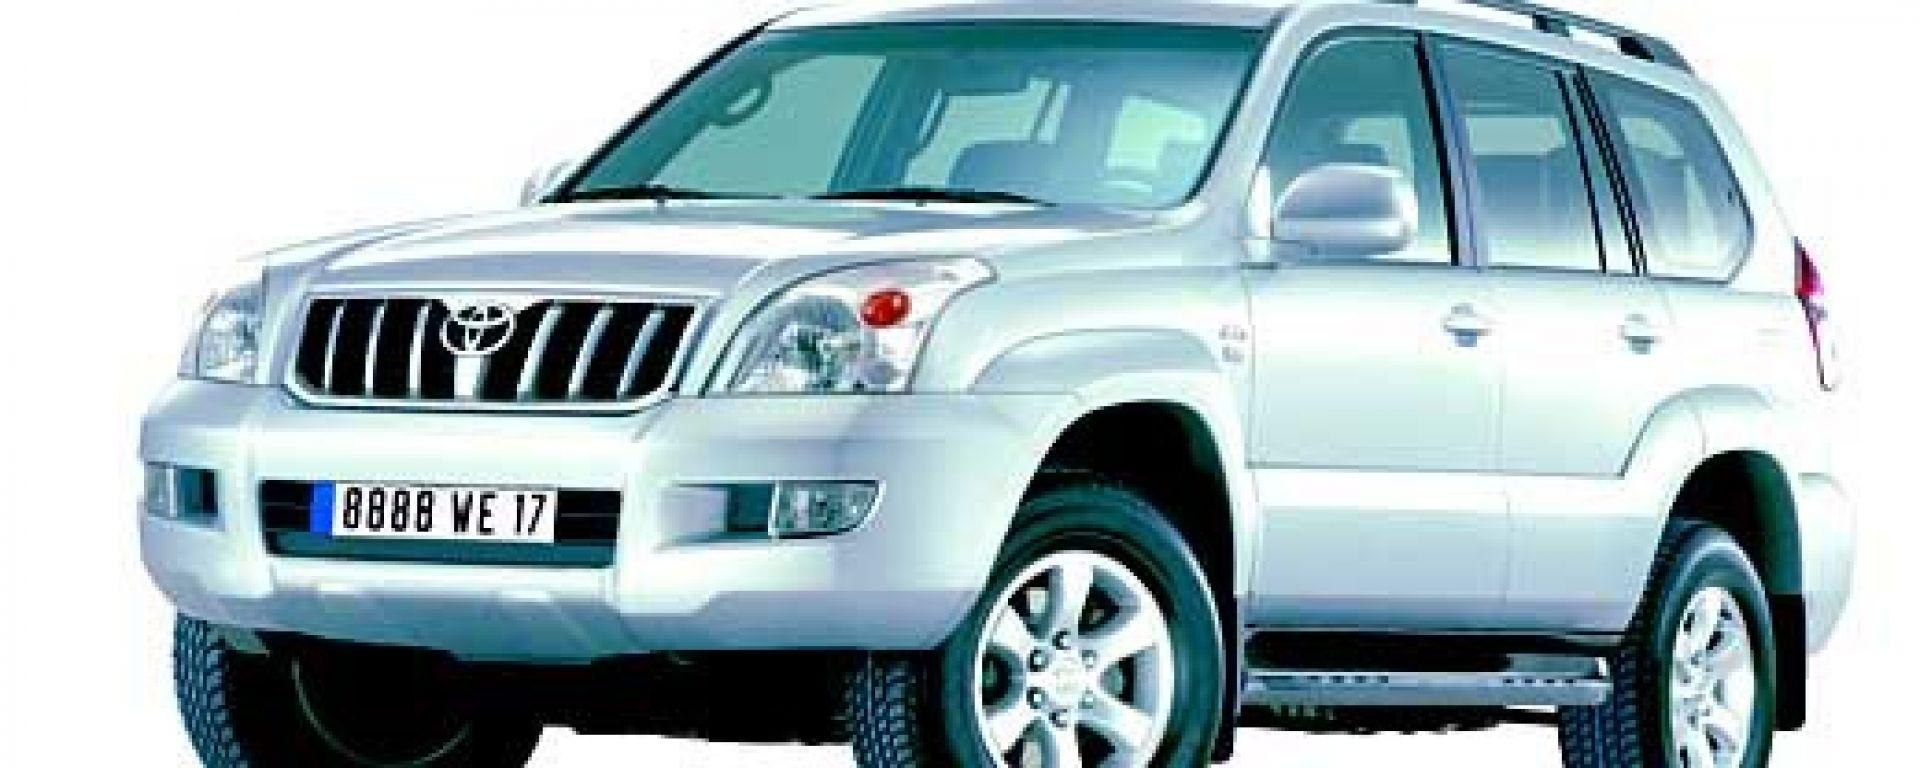 Anteprima:Toyota Land Cruiser my 2003